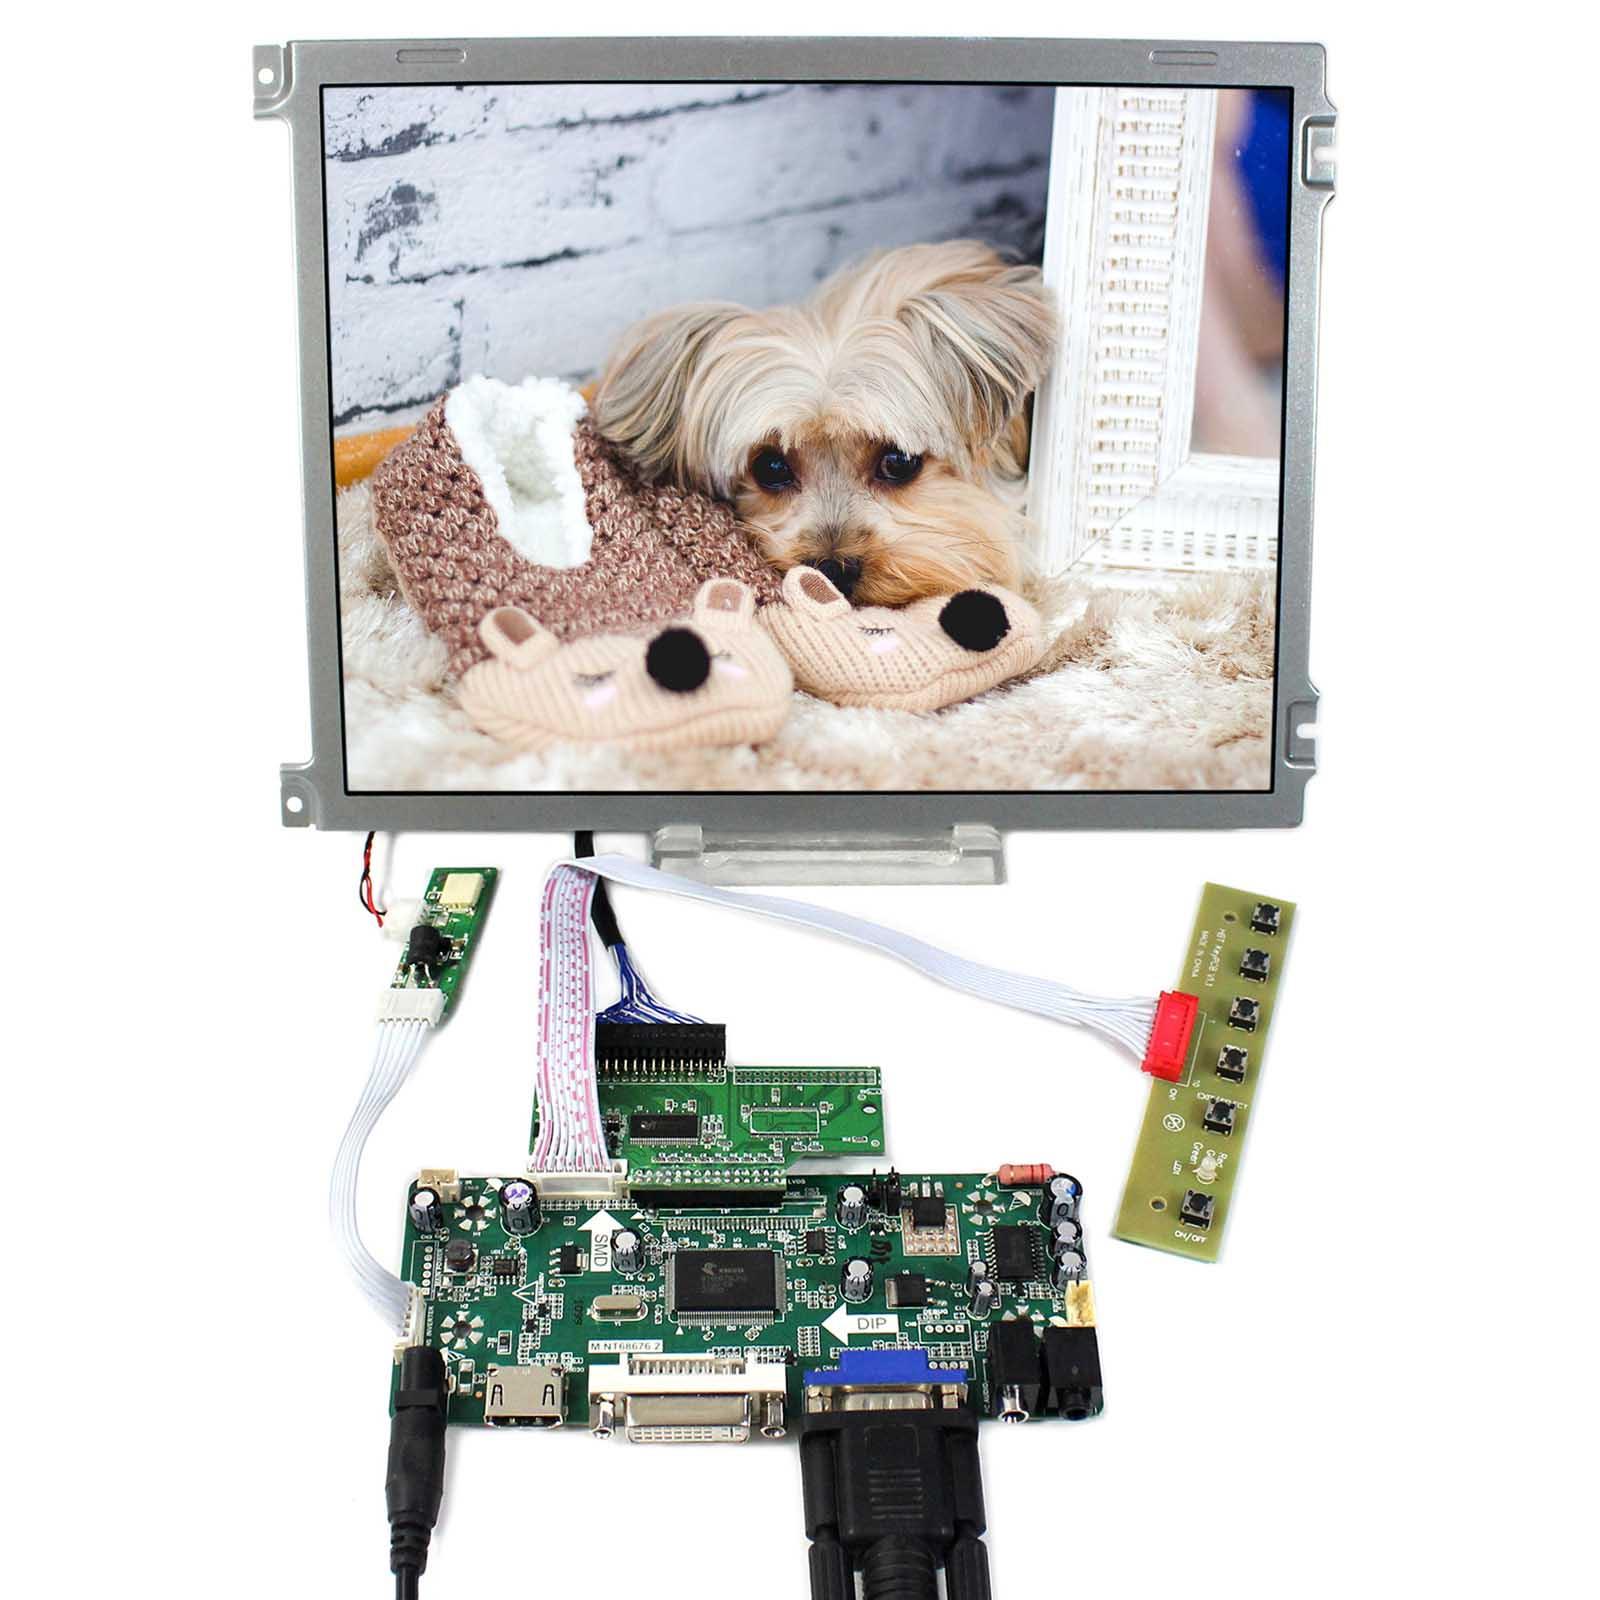 HDMI+DVI+VGA+Audio Controller Board With 10.4inch 640x480 AA104VH01 LCD Screen